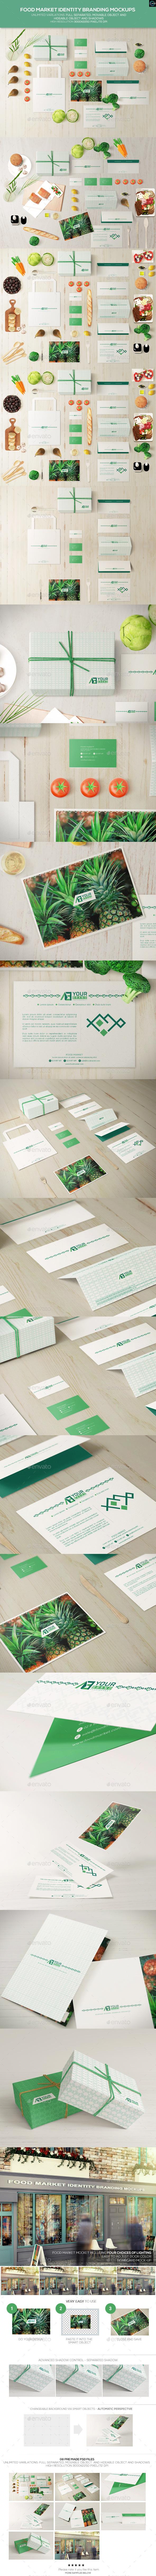 GraphicRiver Food Market Identity Branding Mockups 11268024